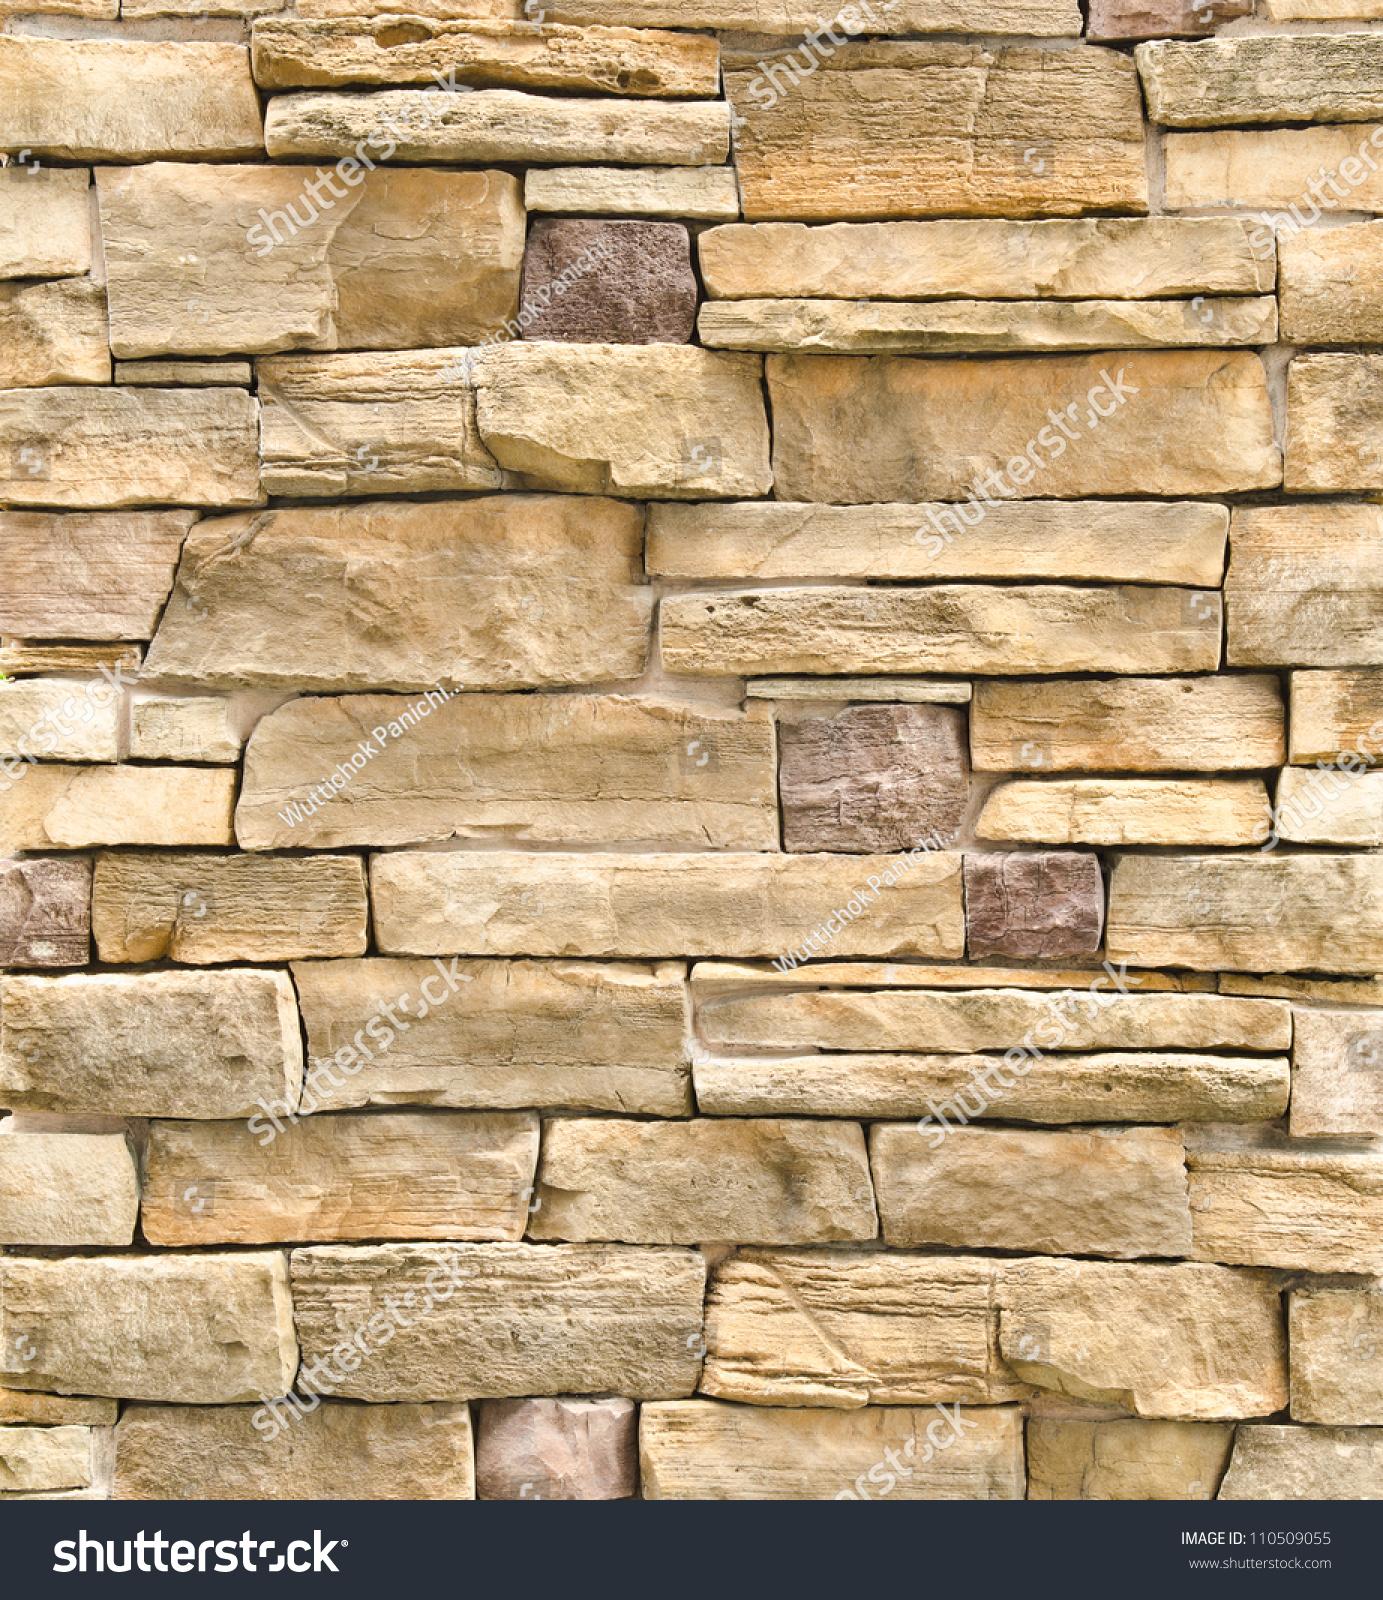 Modern Stone Decorative Wall Ideas - All About Wallart - adelgazare.info